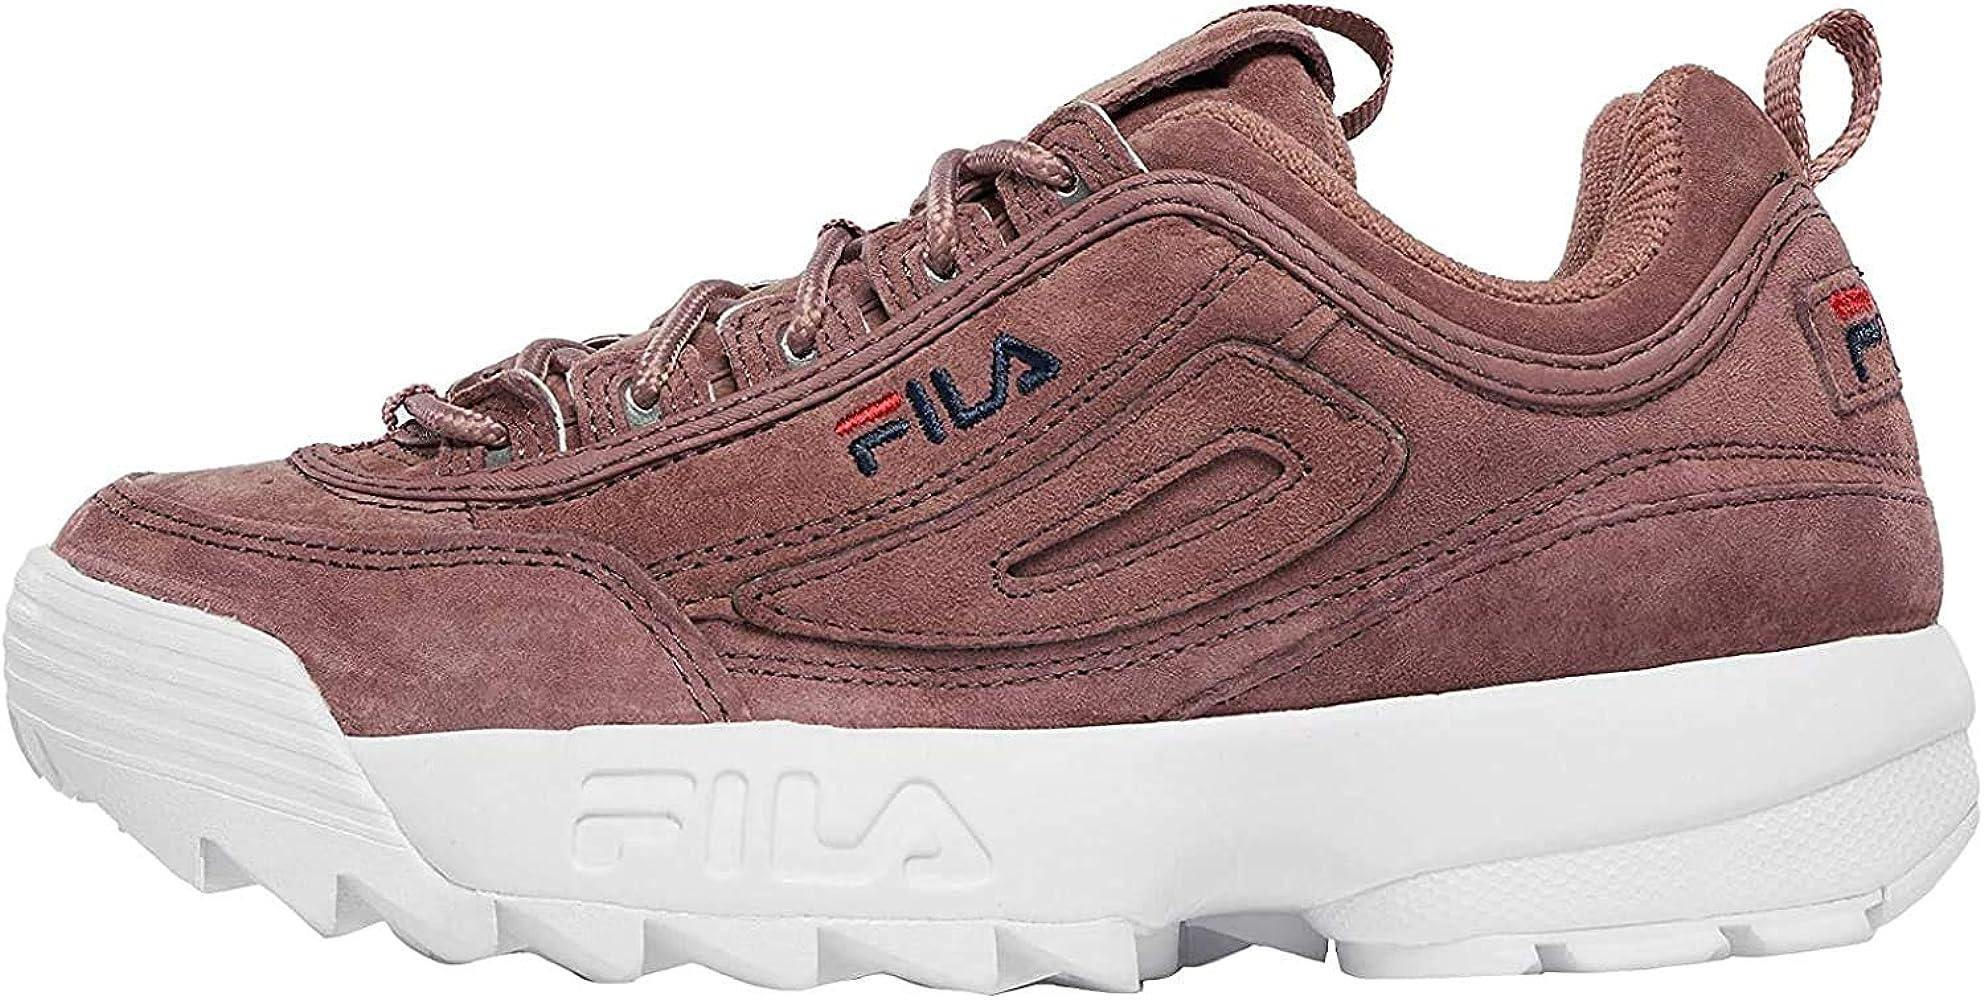 Fila Disruptor S Low Wmn, Zapatillas para Mujer, Rosa (Pink ...